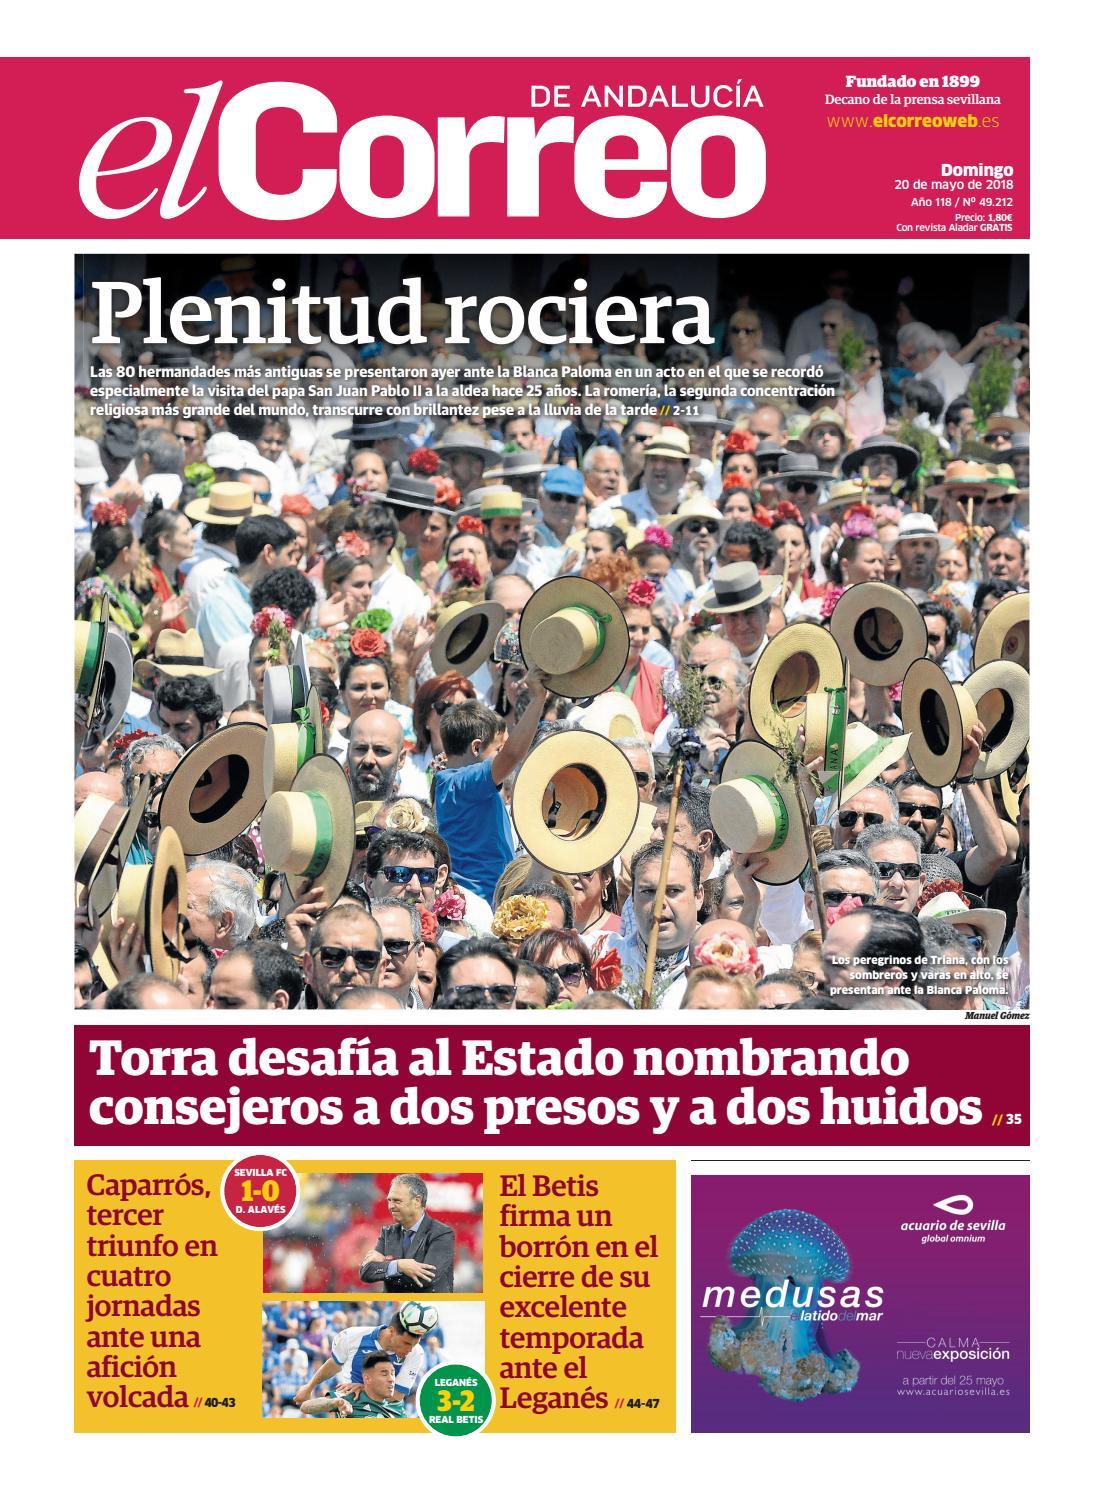 20.05.2018 El Correo de Andalucía by EL CORREO DE ANDALUCÍA S.L. - issuu ffd960a85a3